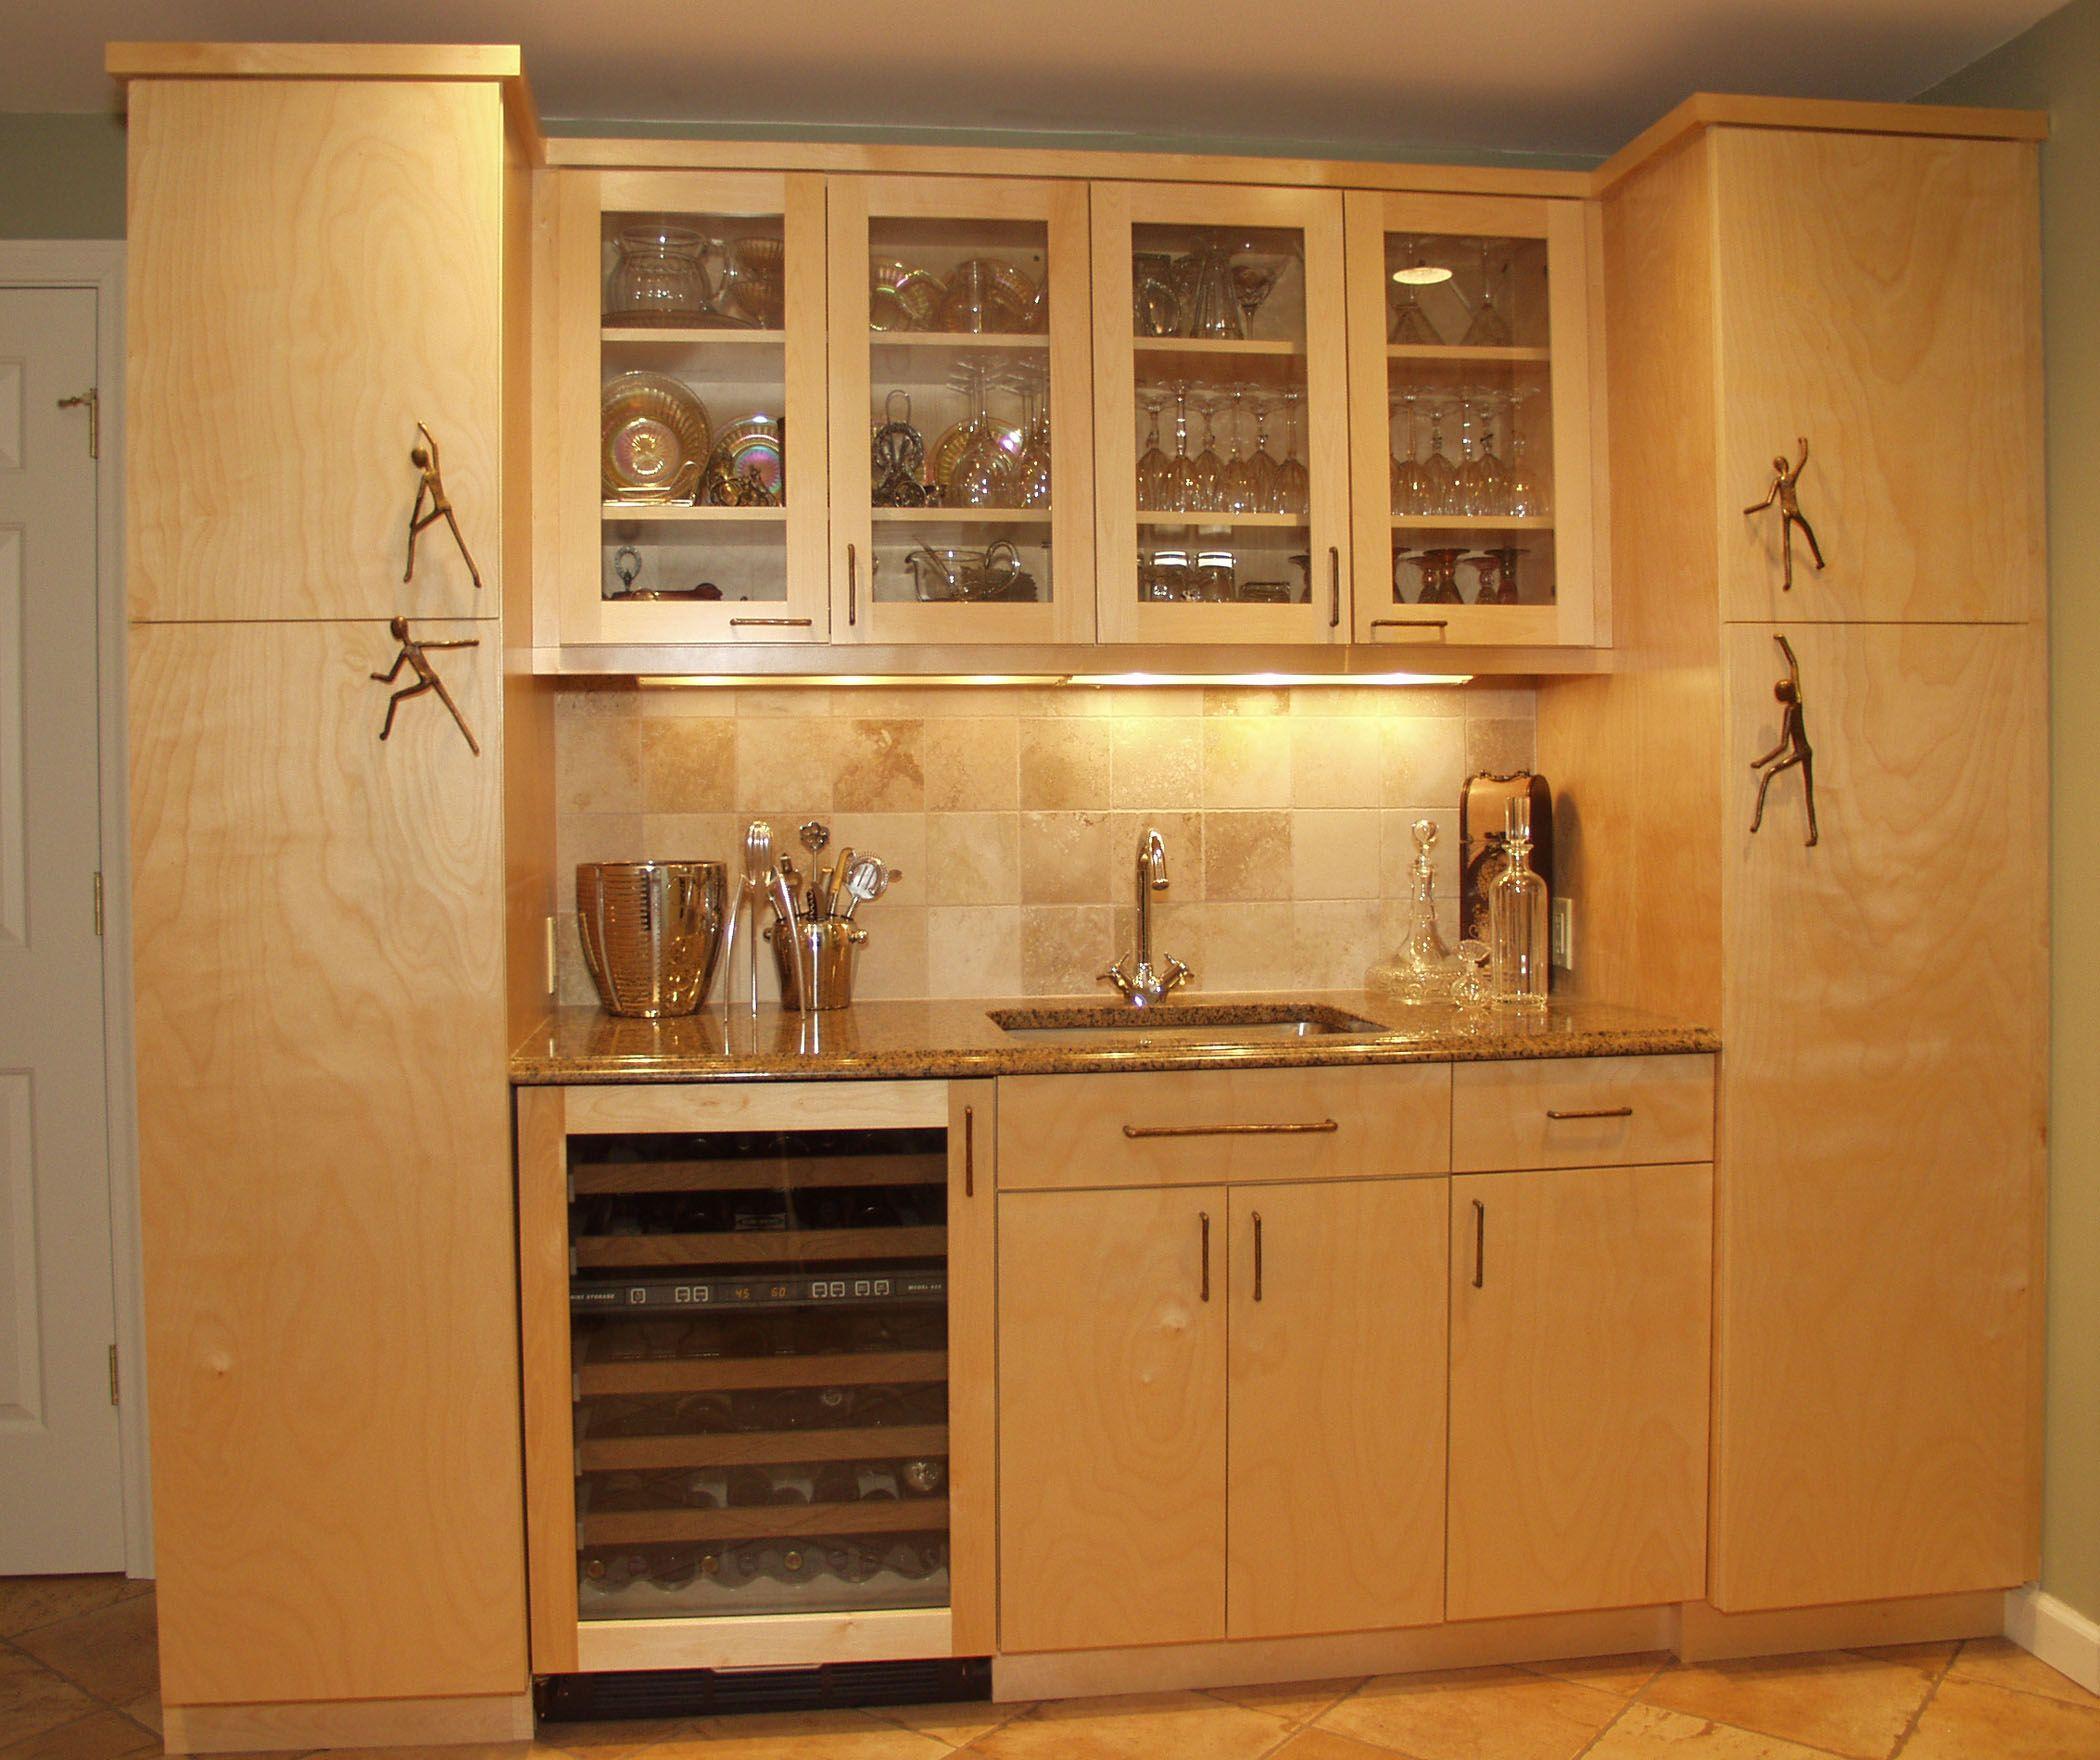 Custom Wood Products bar entertain cabinets